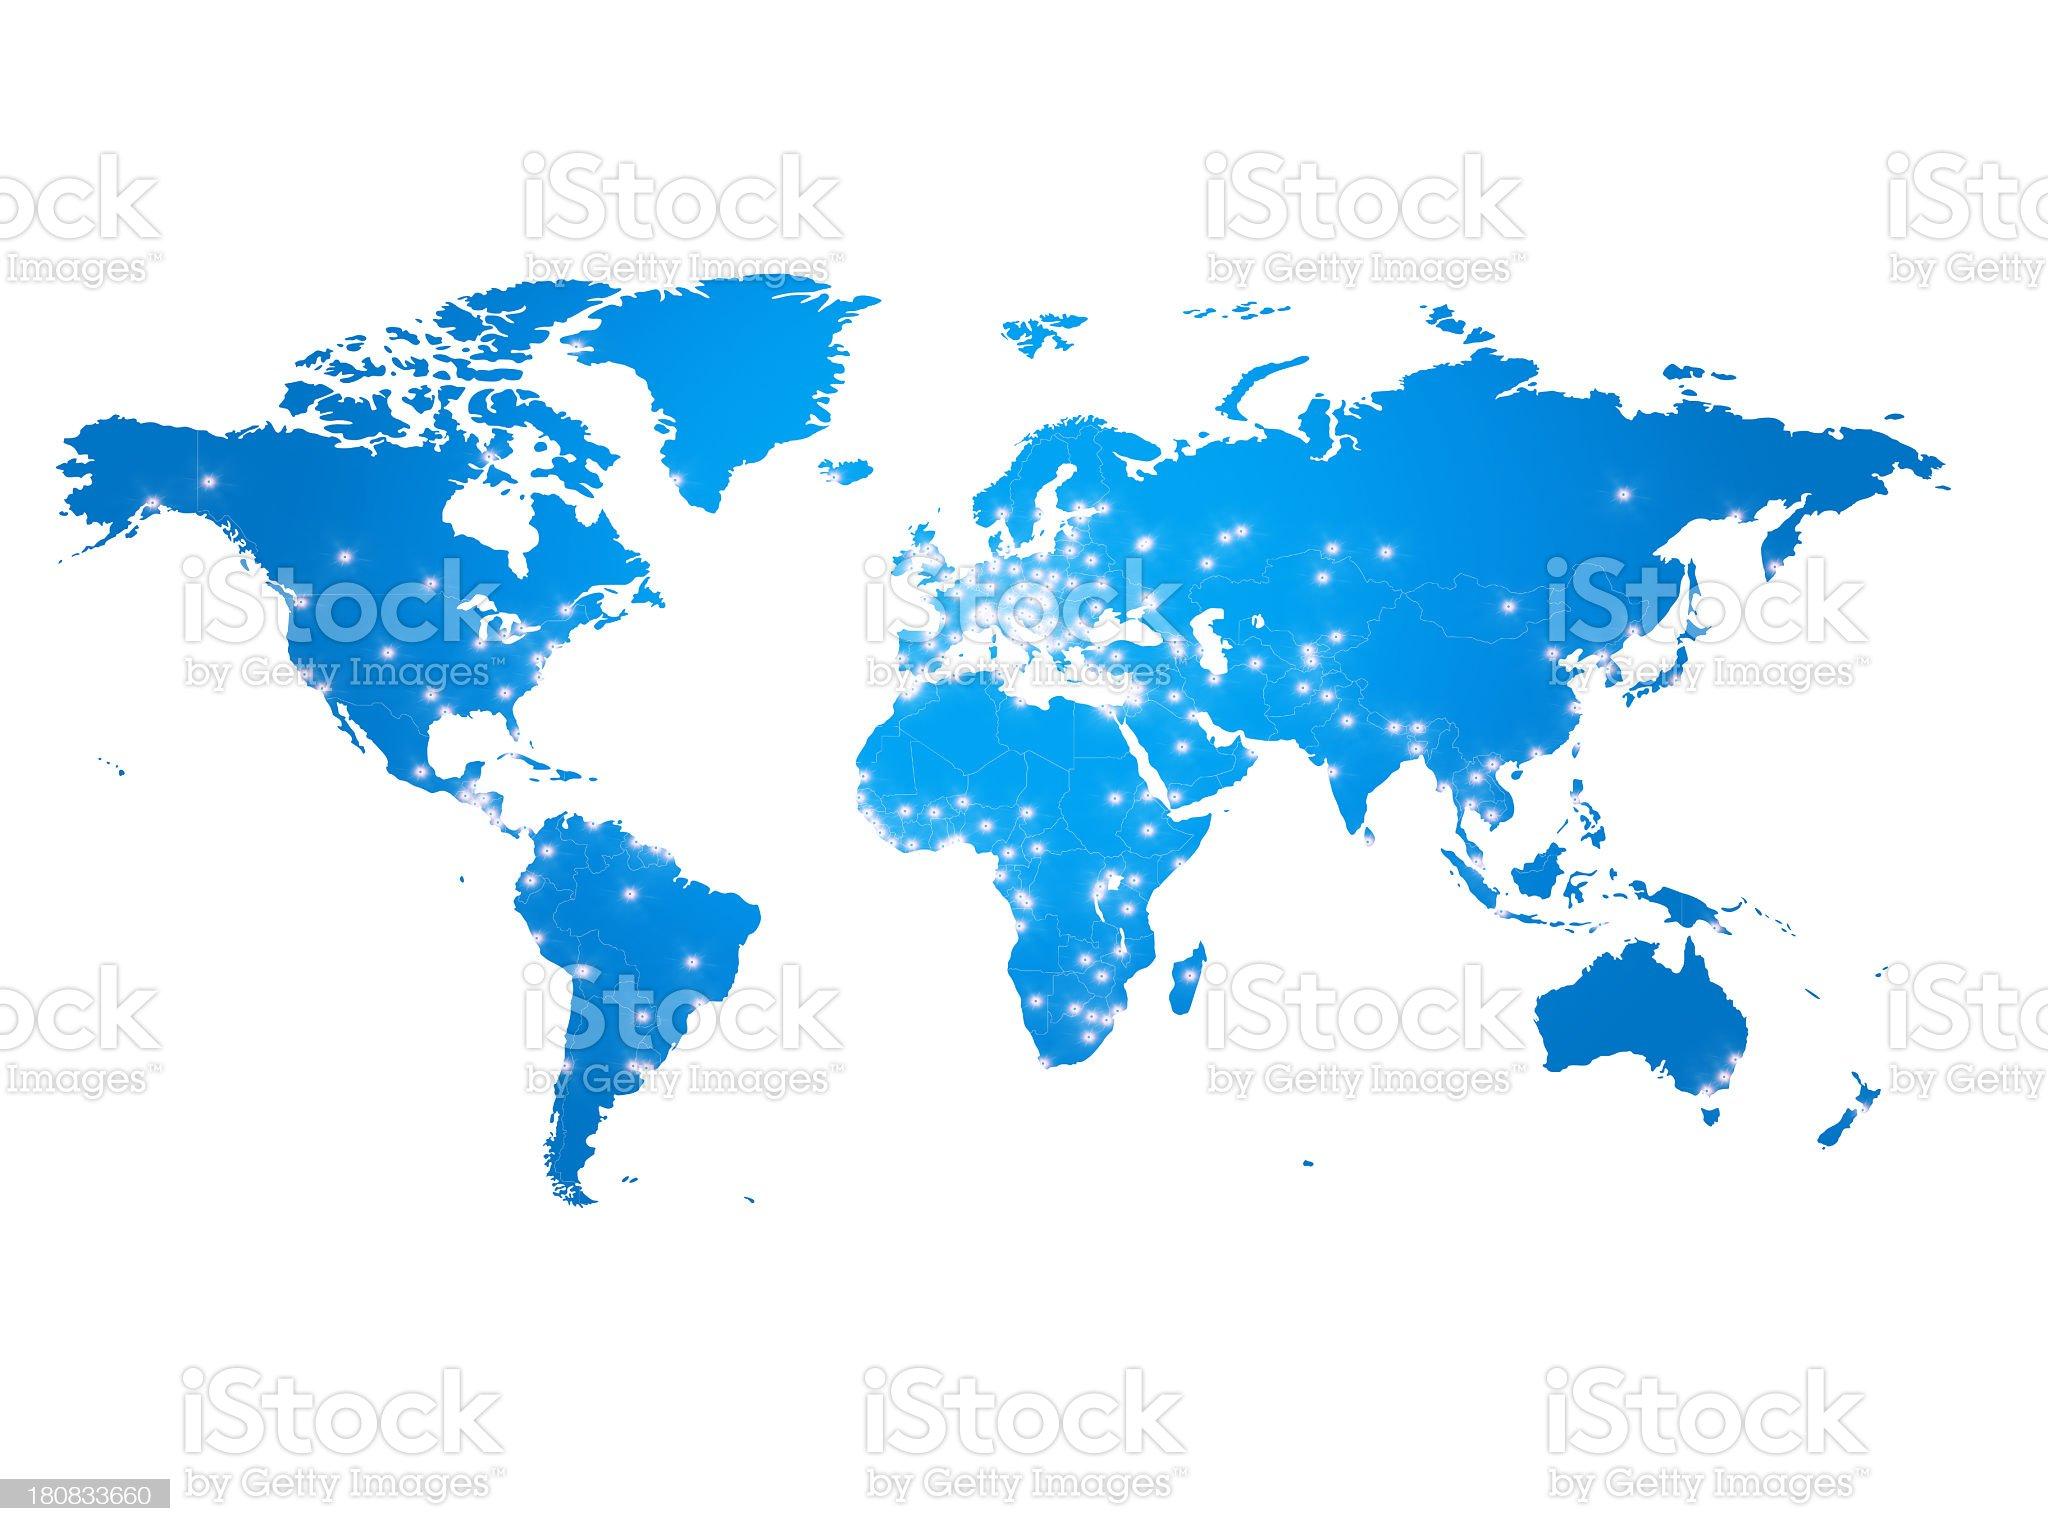 world map royalty-free stock photo